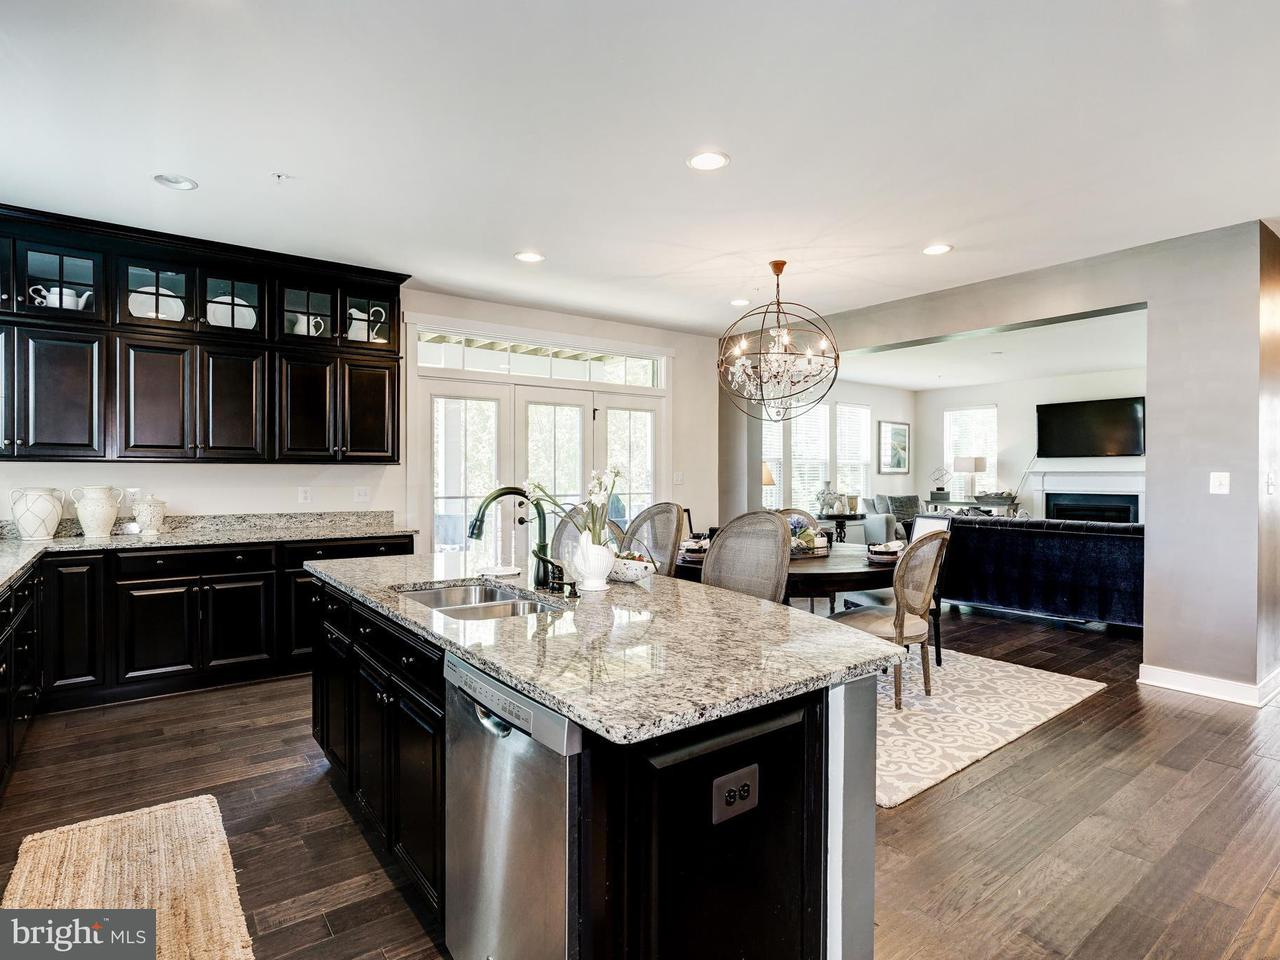 Single Family Home for Sale at 2472 POTOMAC RIVER BLVD 2472 POTOMAC RIVER BLVD Dumfries, Virginia 22026 United States